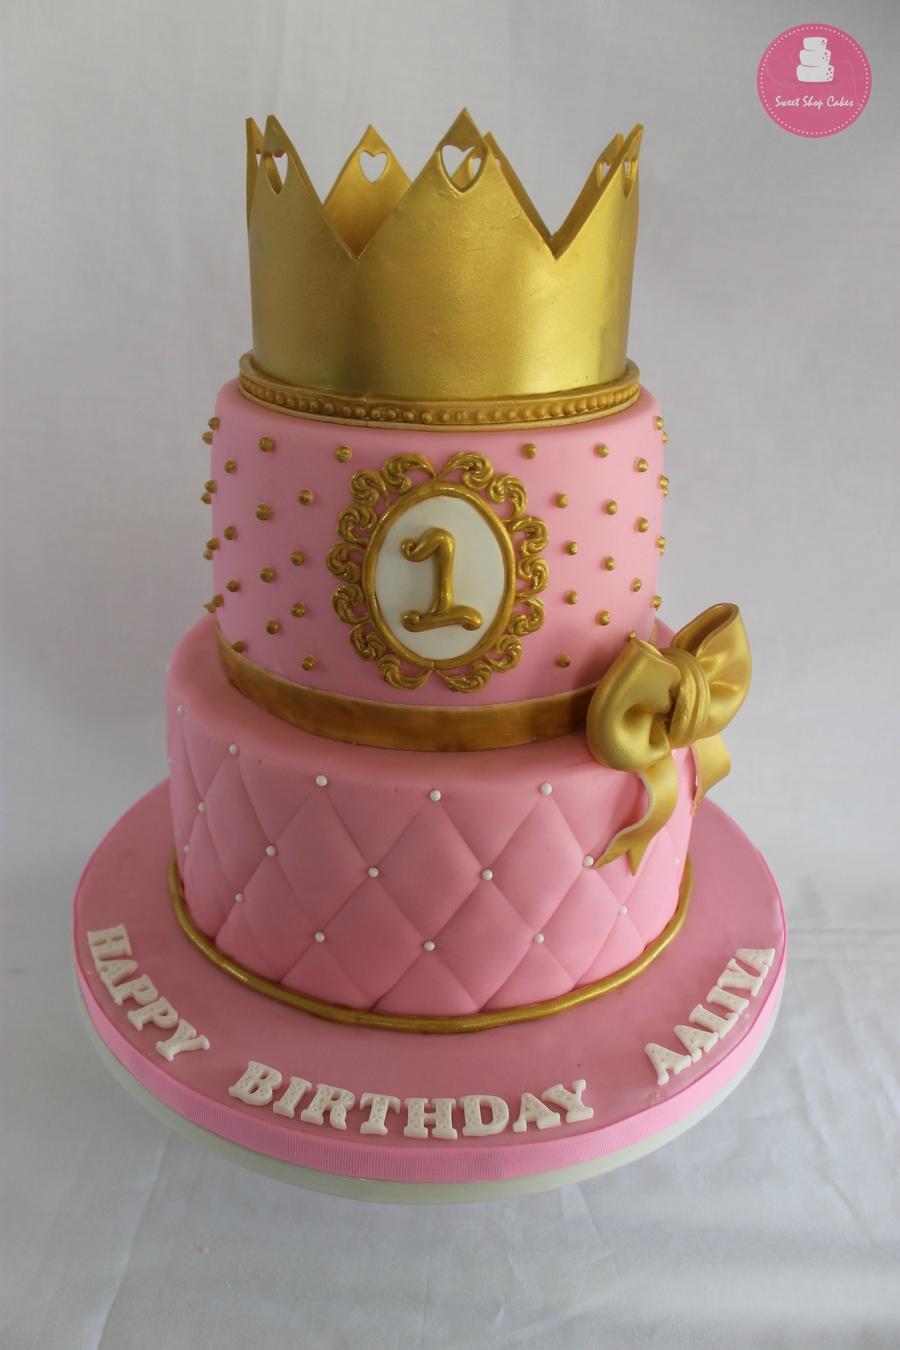 b7PBAf0mxF-princess-themed-birthday-cake_900.jpg